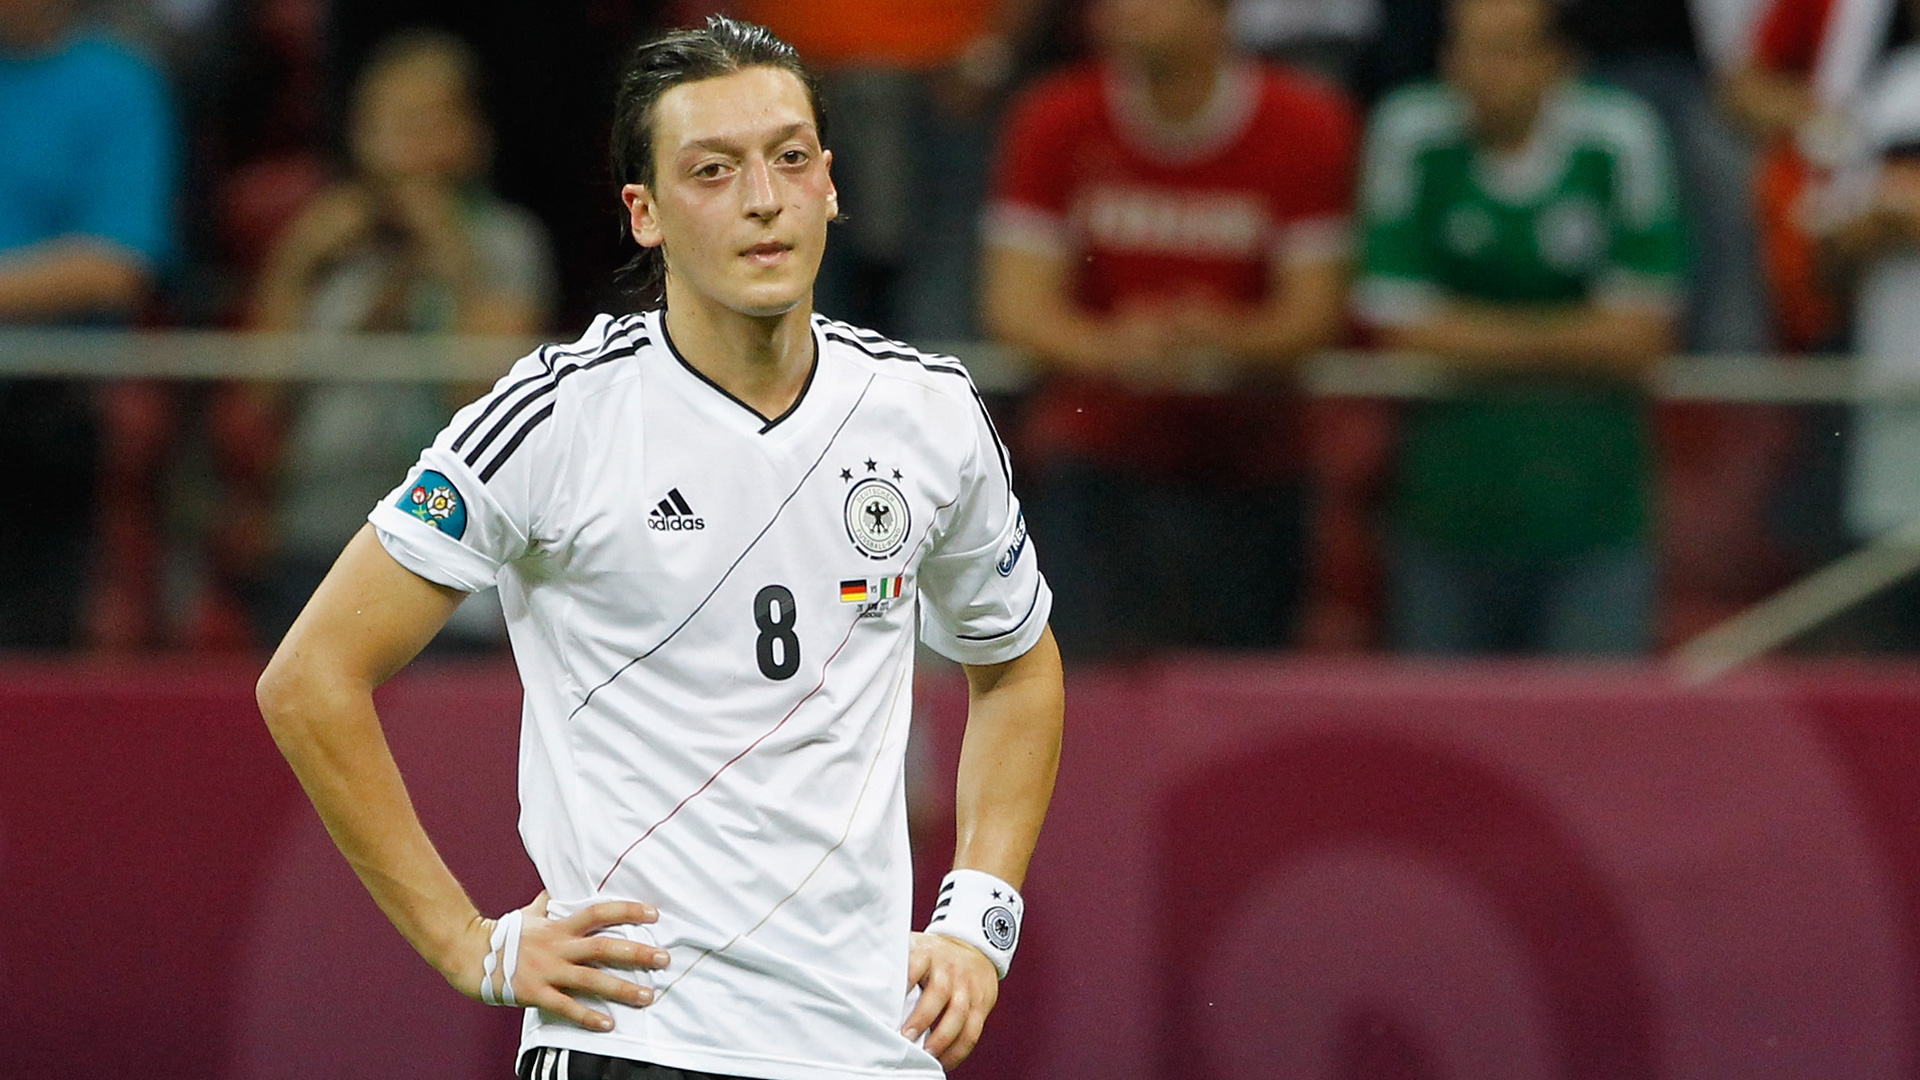 Mesut-Özil-DFB-28062012